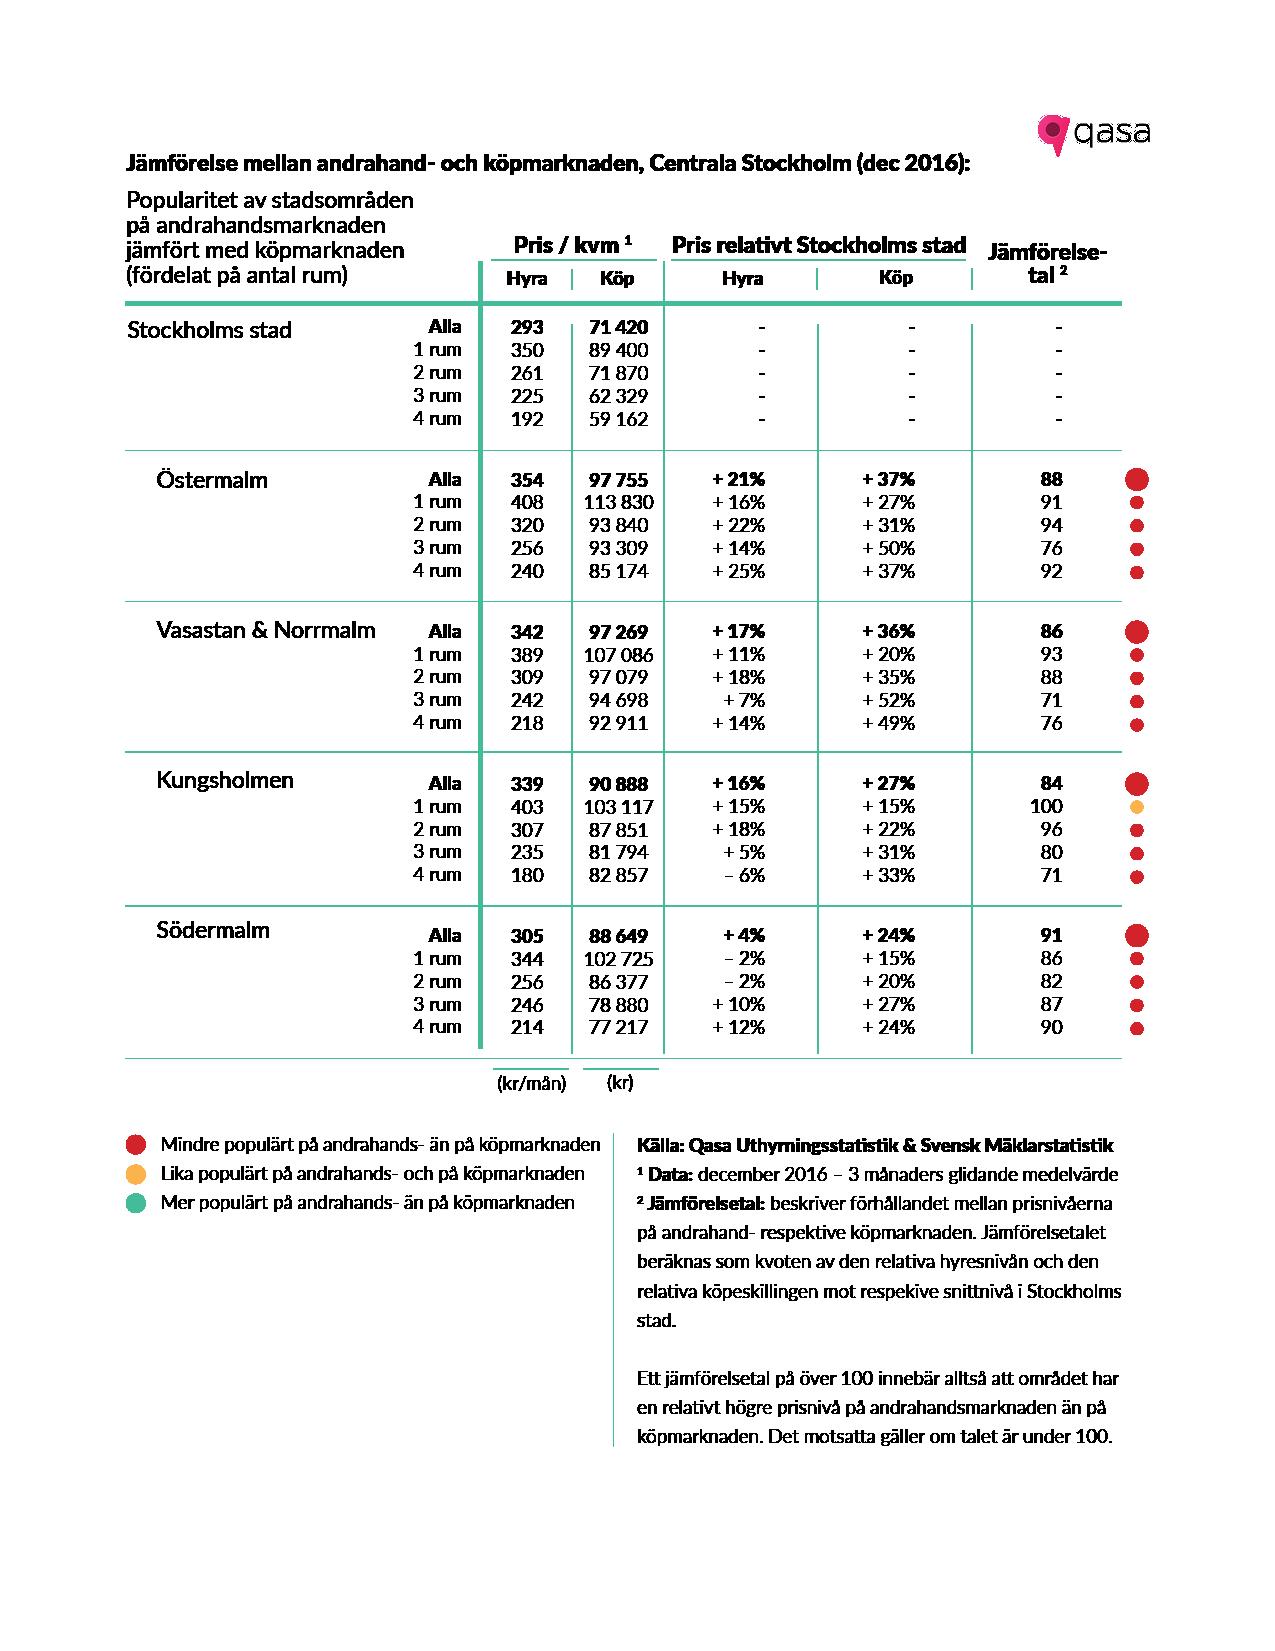 2. Tabell Stockholms Hyresrapport - Jämförelsetal (Centrala Stockholm)